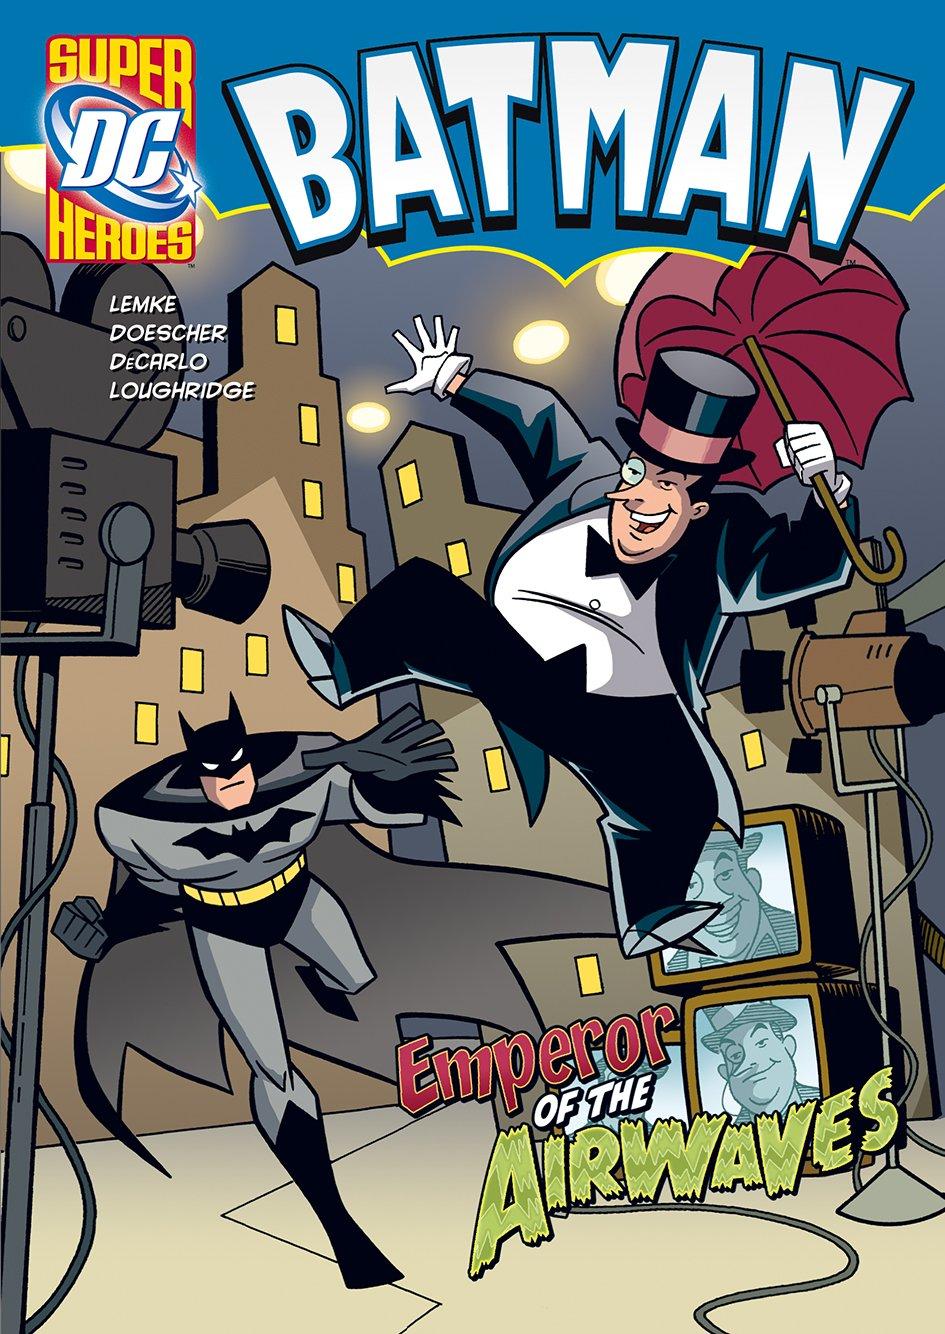 Read Online The Emperor of the Airwaves (DC Super Heroes. Batman) ebook